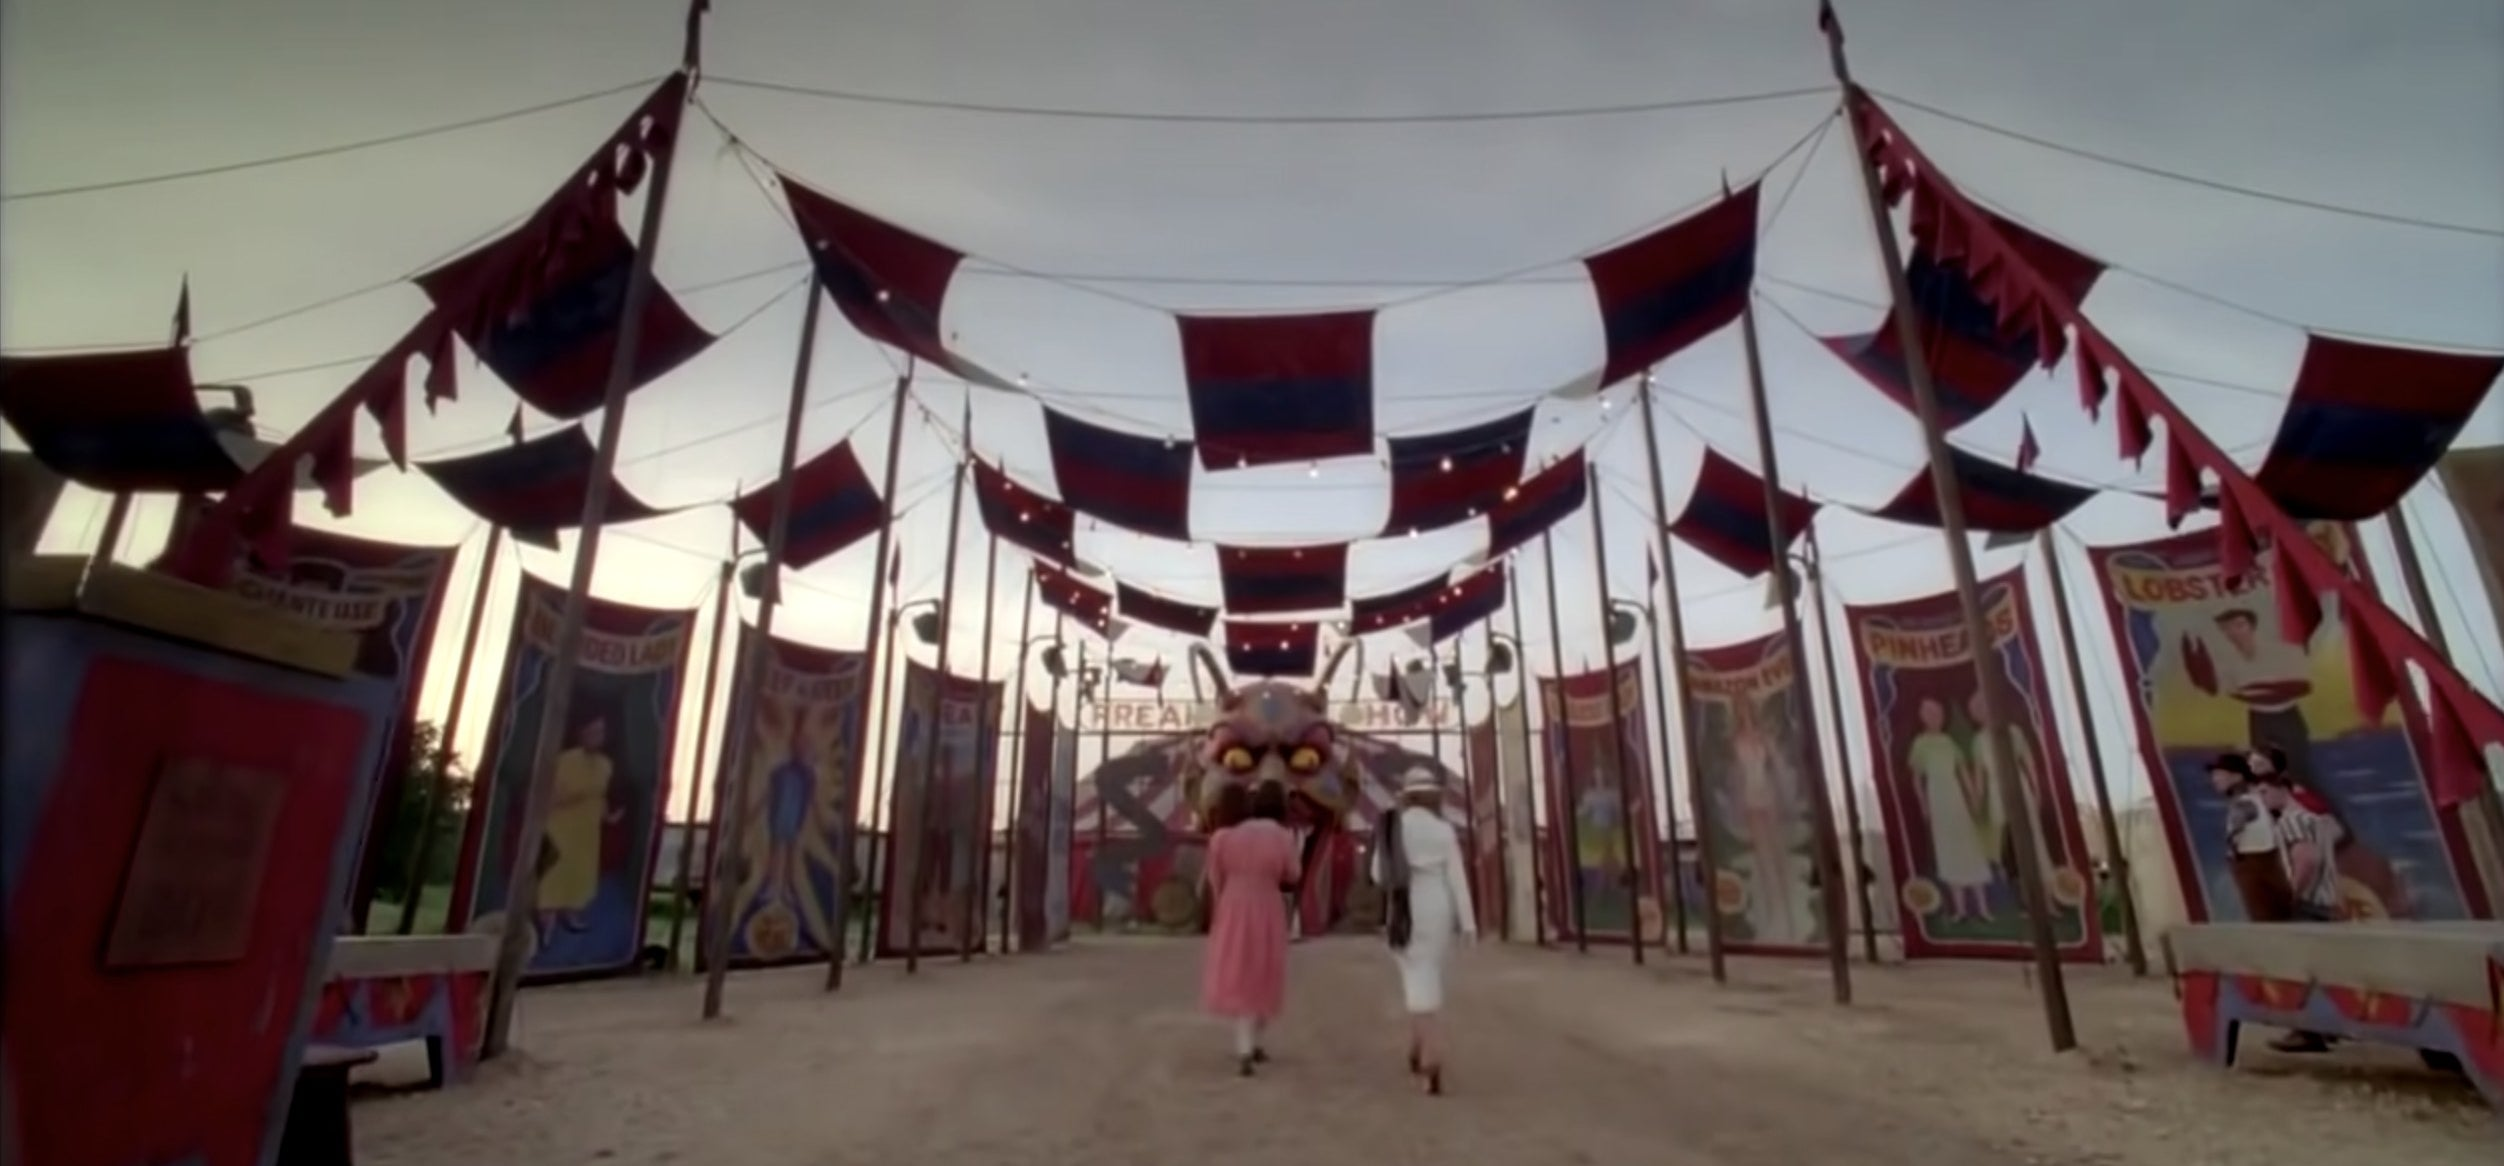 Circus in AHS: Freak Show